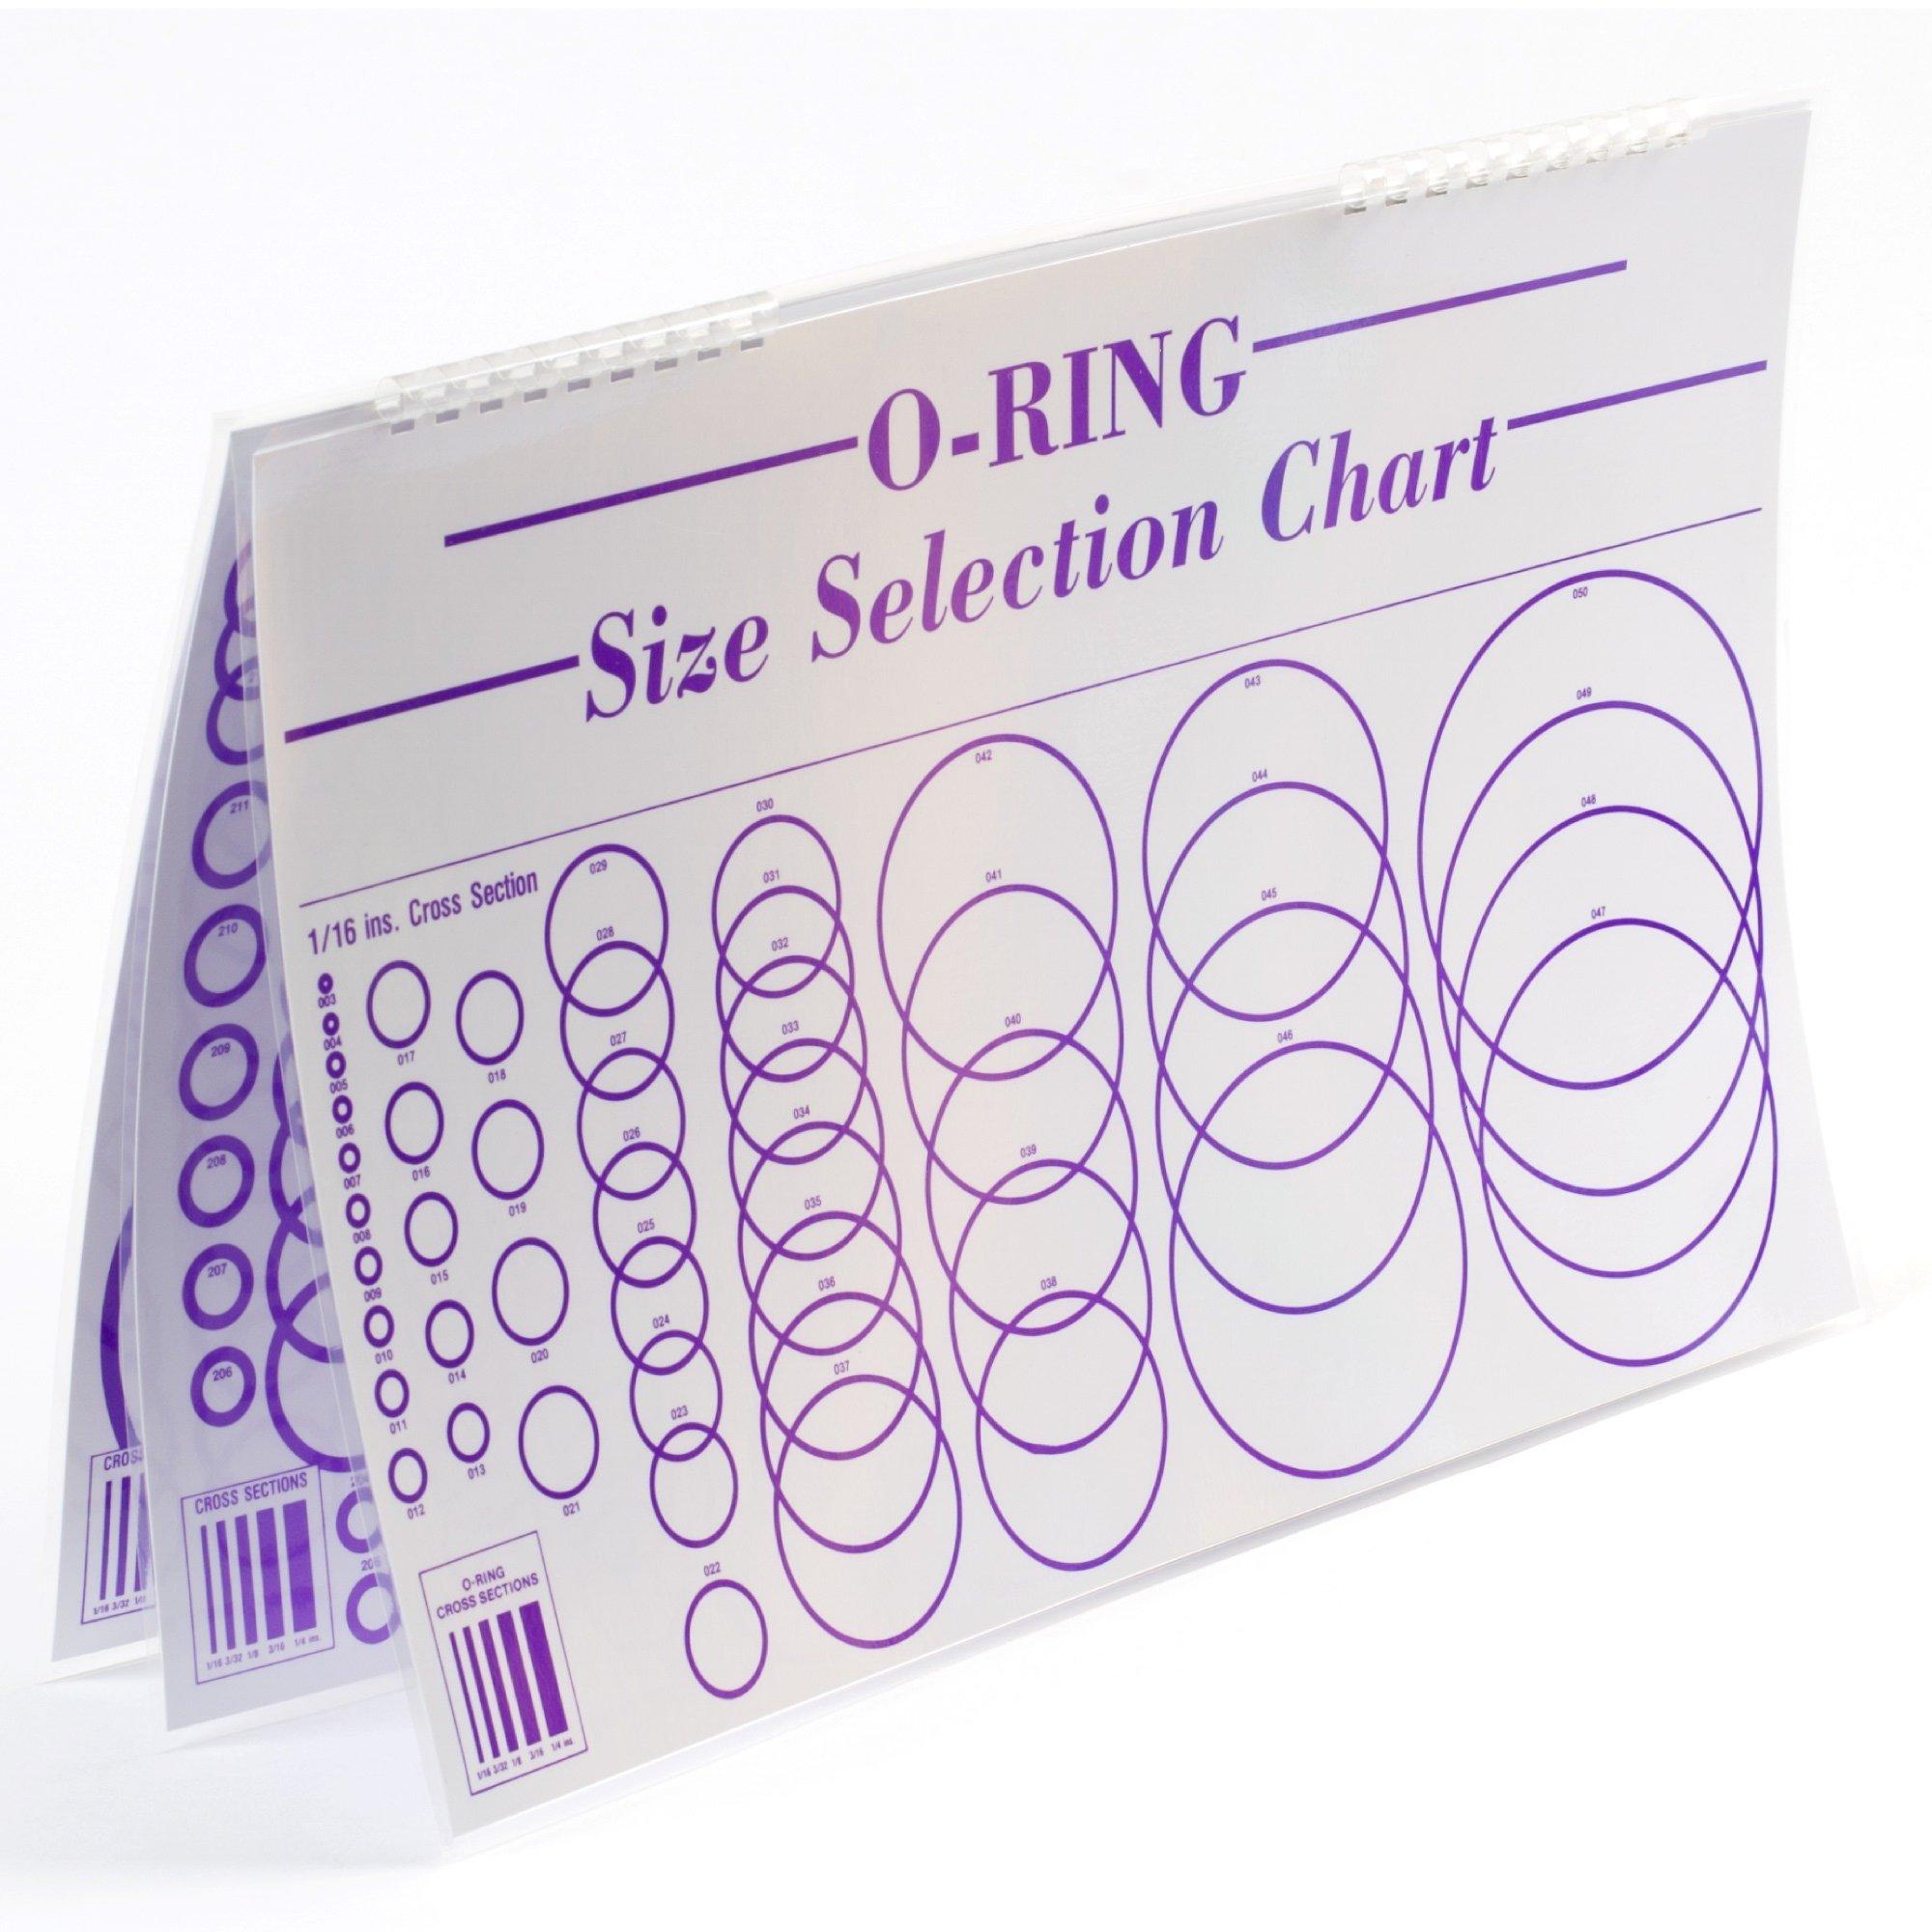 Small Parts O-Ring Sizing Chart, Laminated, 3 Sheets, Paper and Plastic